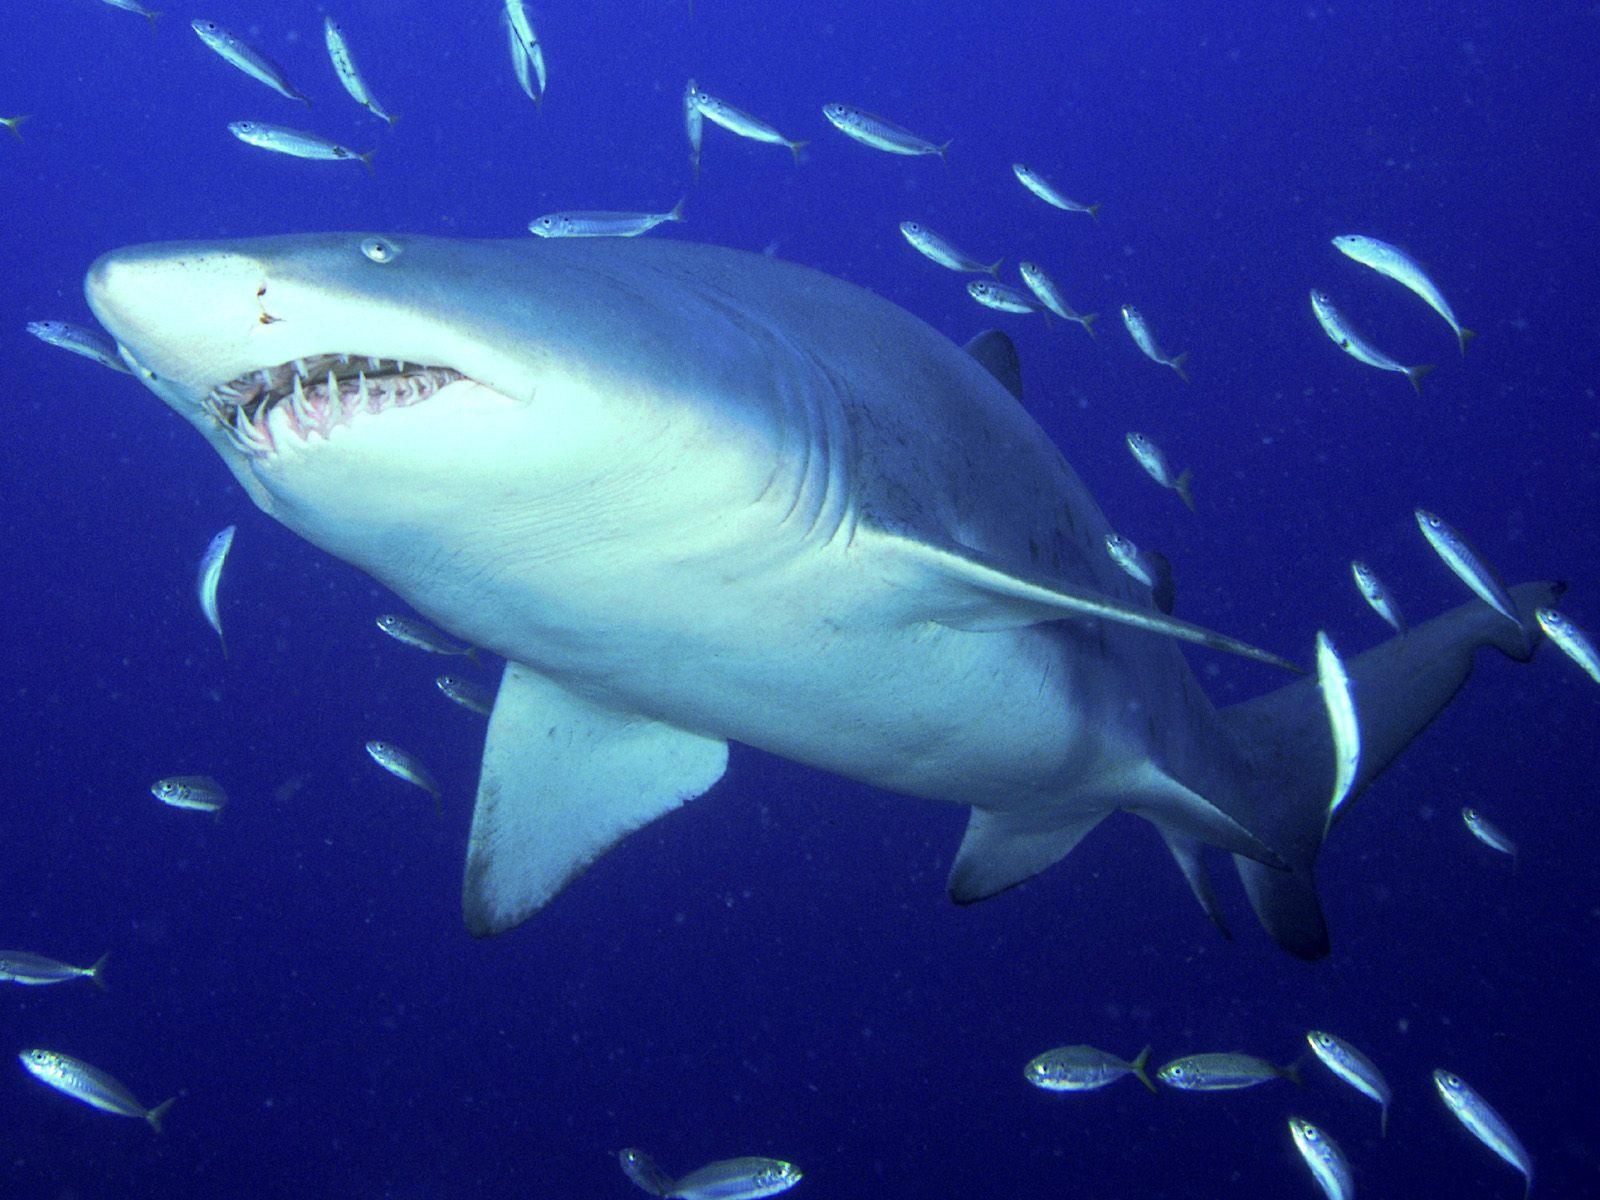 download wallpaper shark 1600 - photo #14